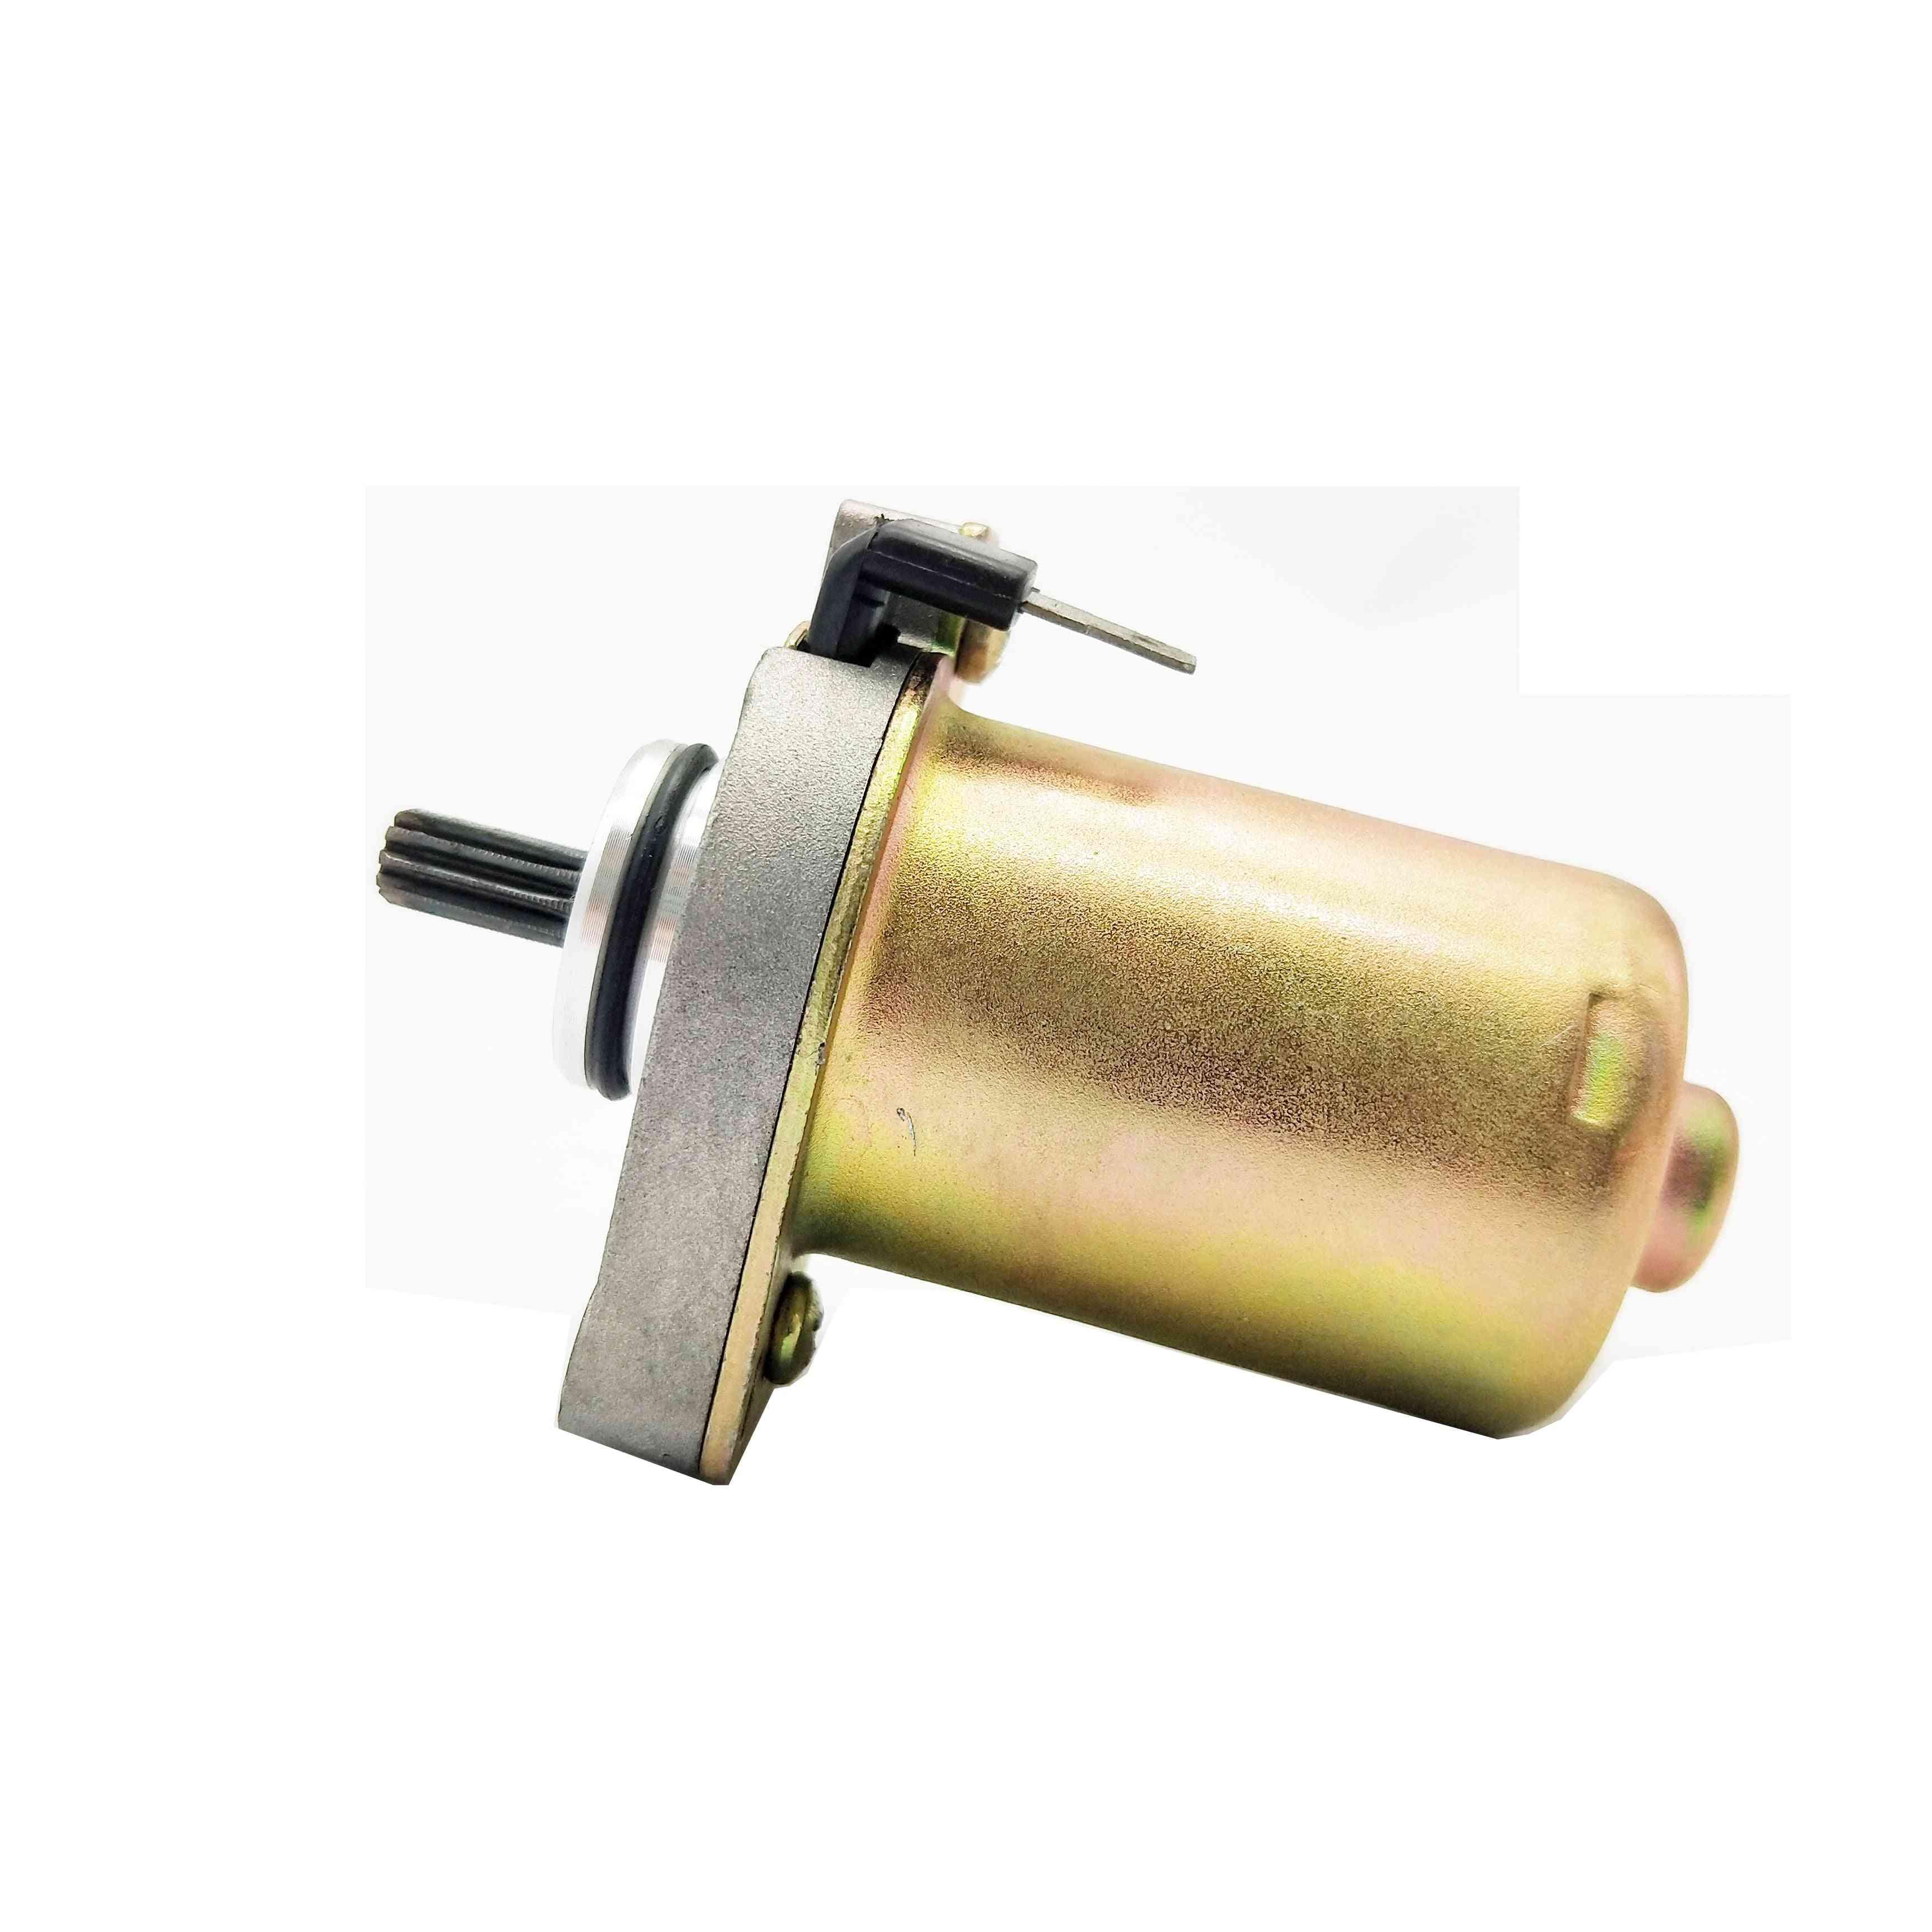 2-stroke, Starter Motor For 50cc Rr Neos- F10, F12, F15